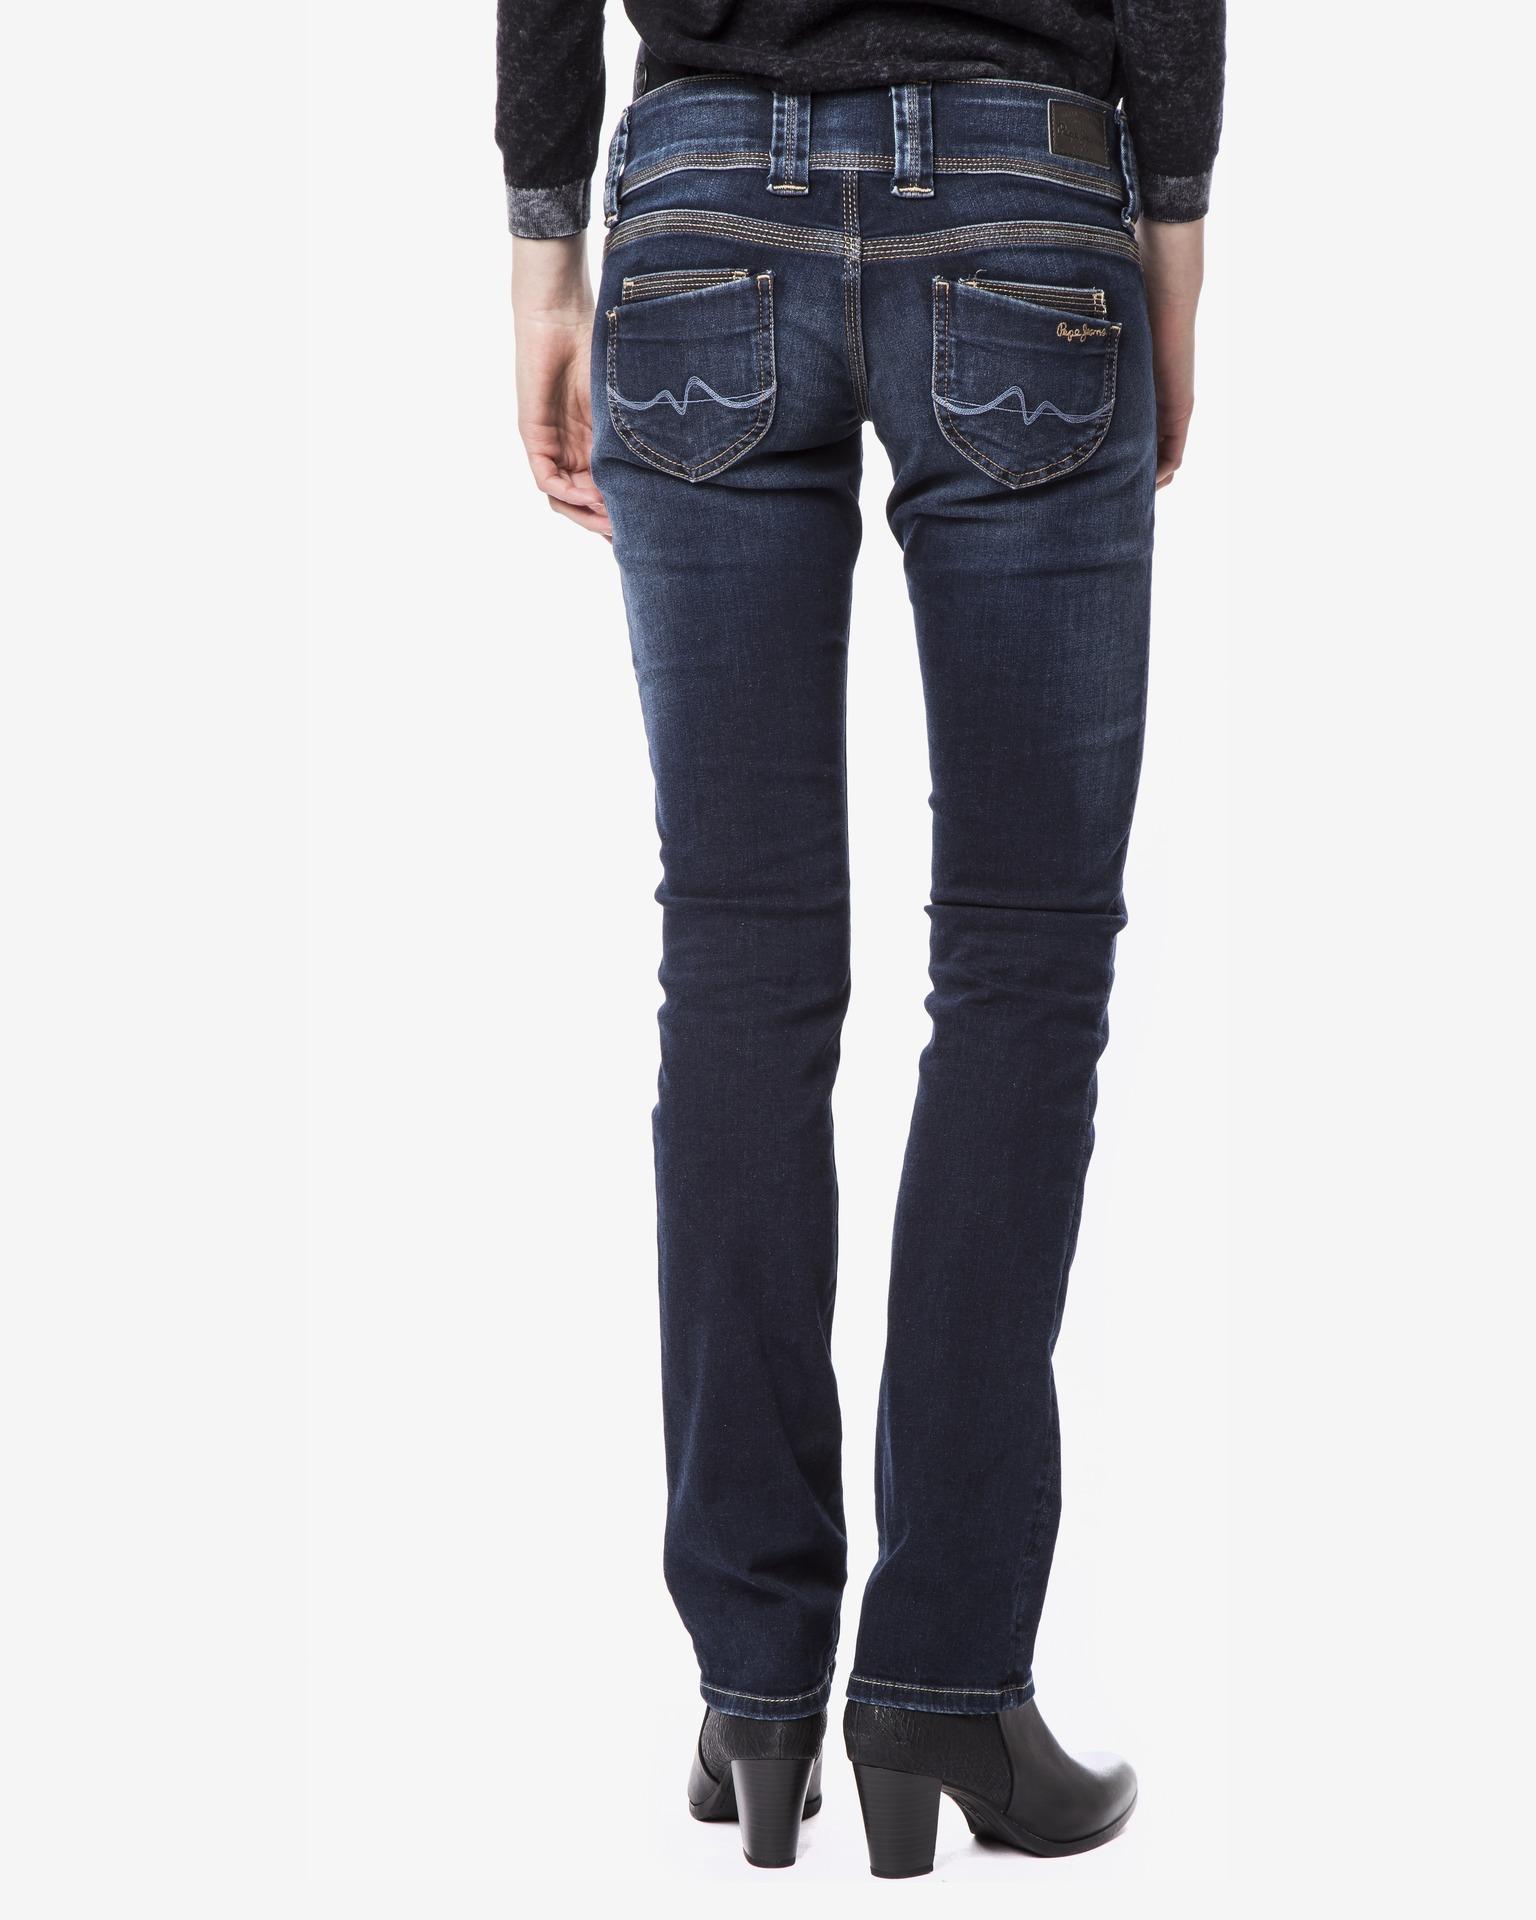 Pepe Jeans - Venus Jeans Bibloo.com 0a57e57dc7